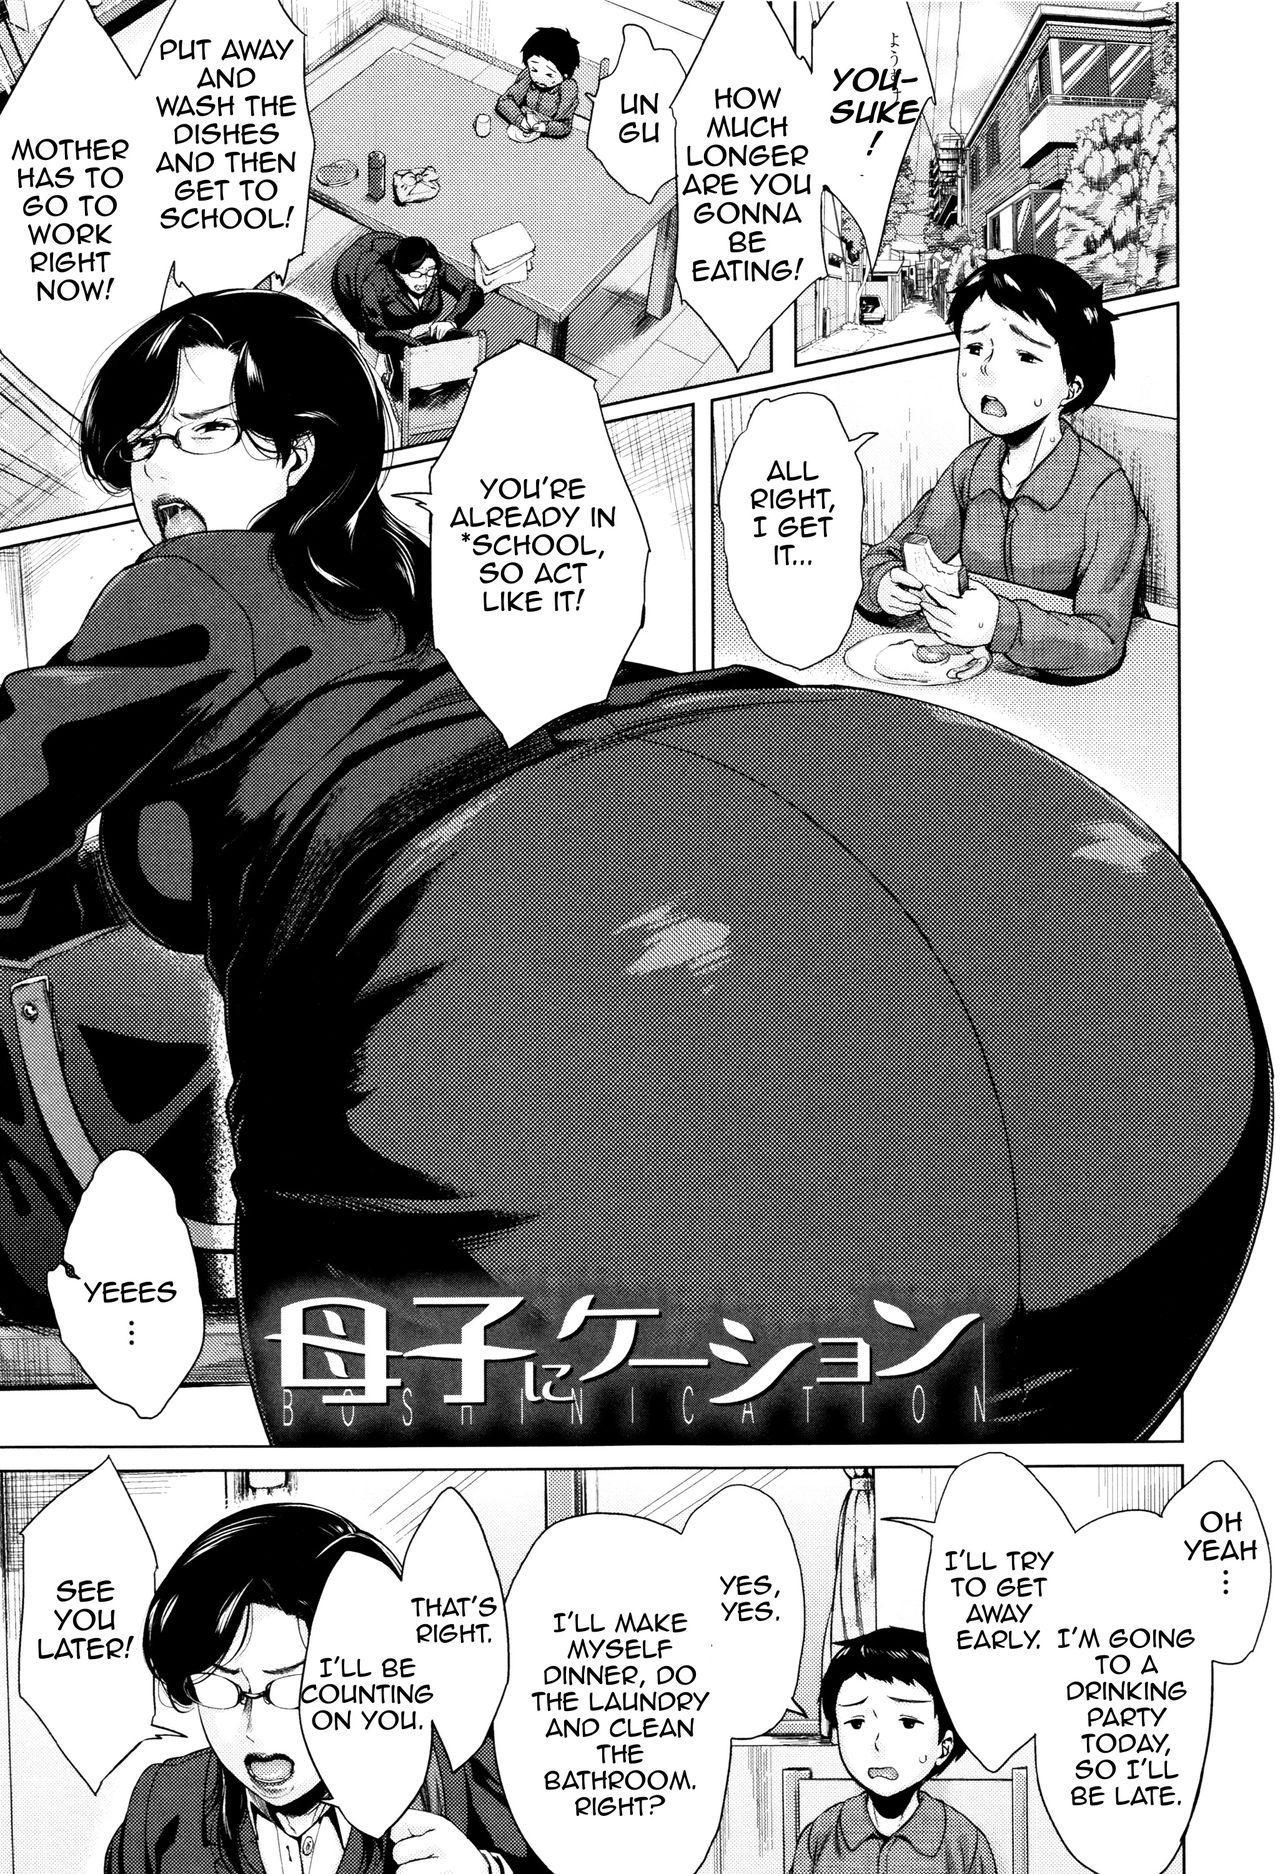 [Jitsuma] Kinyoubi no Haha-tachi e - To Friday's mothers [English] [Amoskandy, desudesu, Kusanyagi] 97